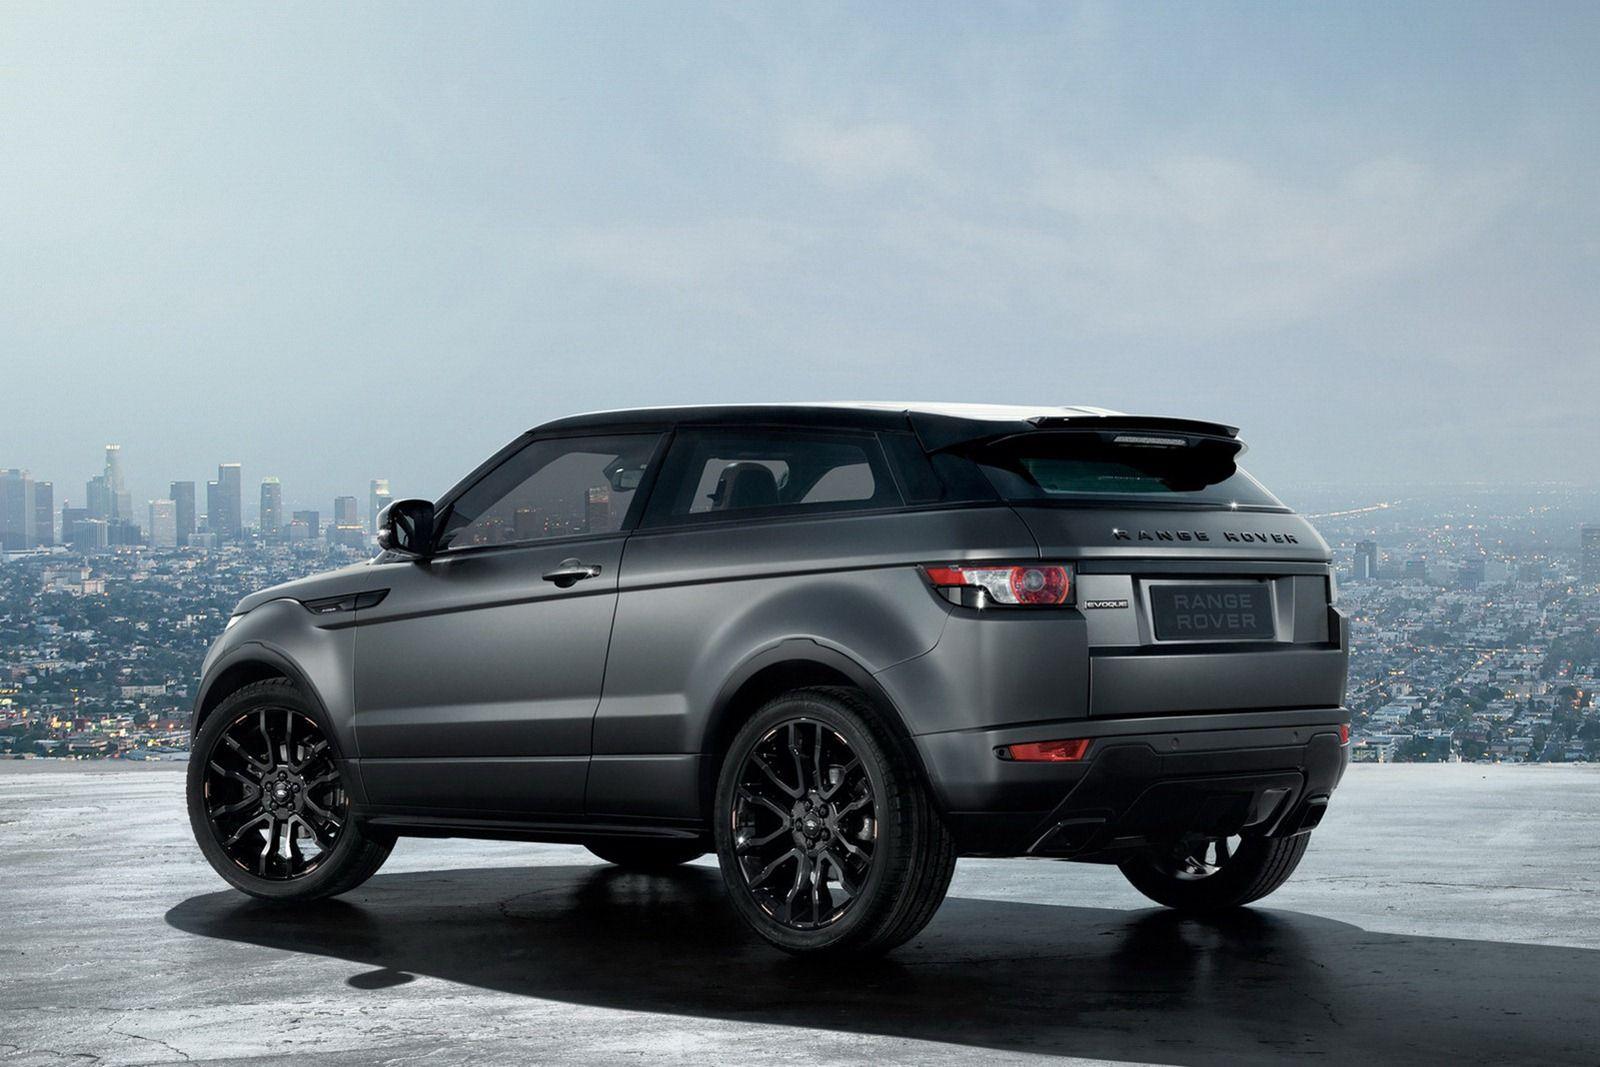 Range Rover Evoque Victoria Beckham Edition Carros